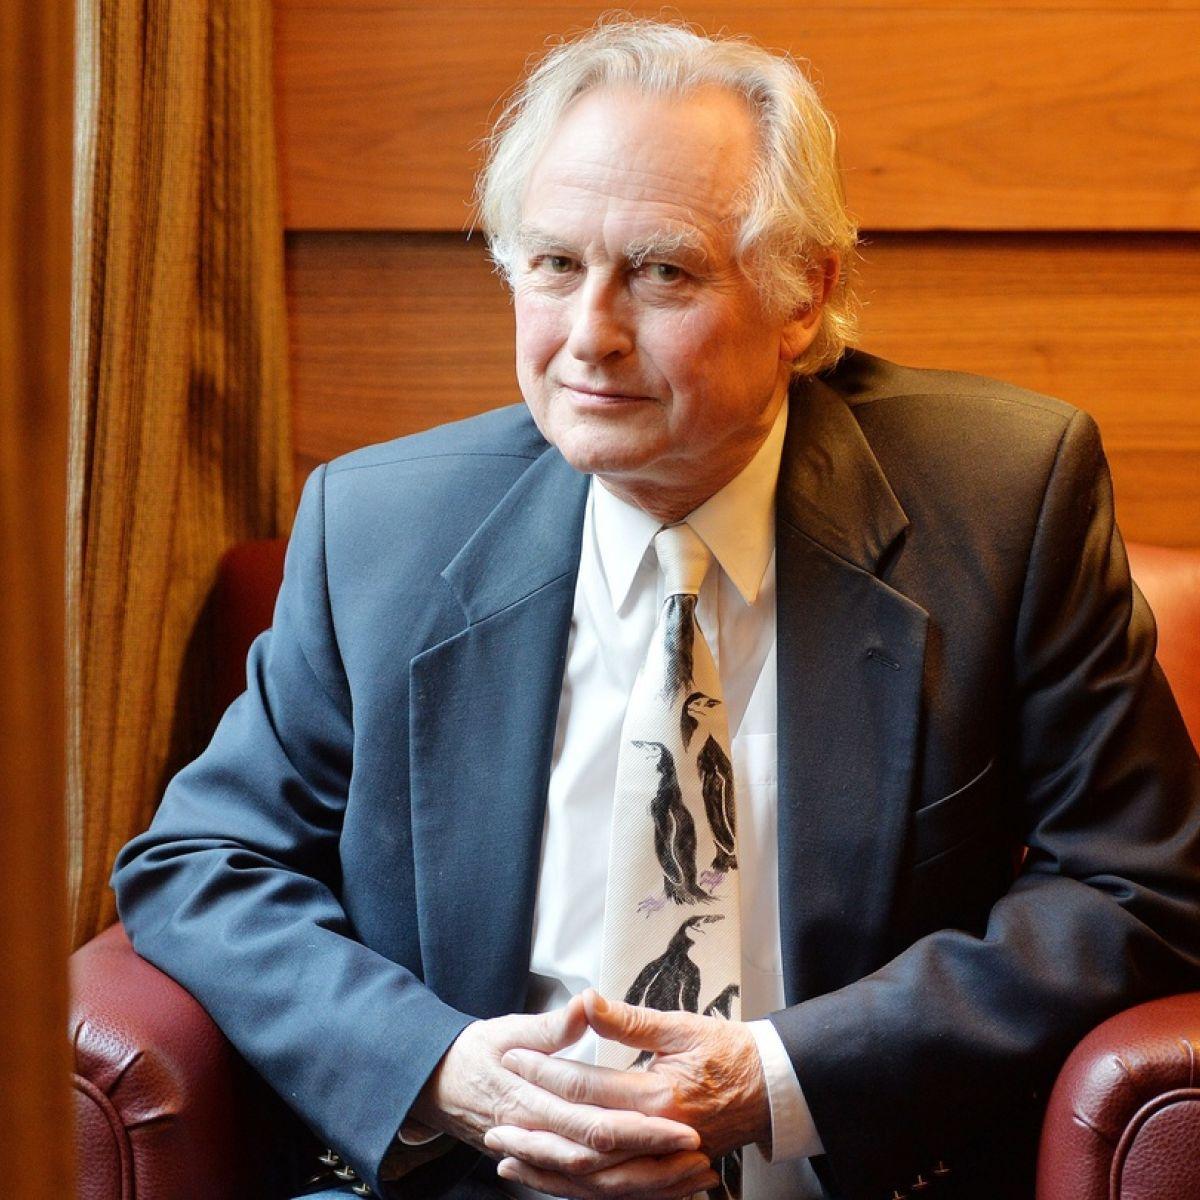 Richard Dawkins vida